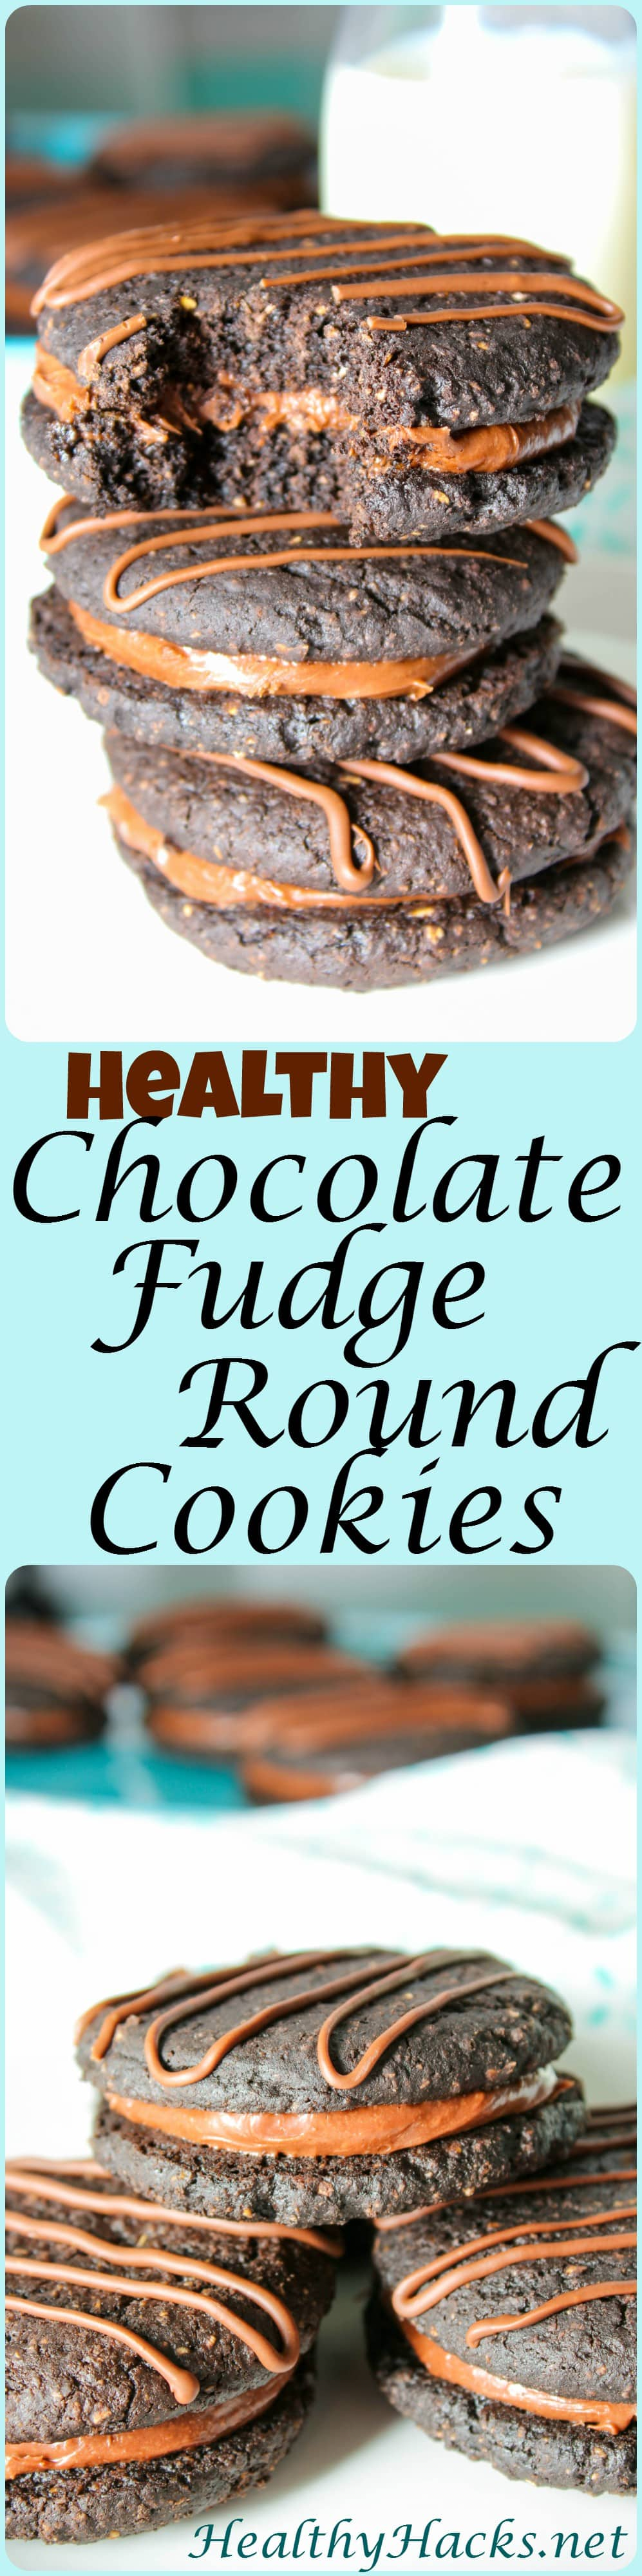 Healthy Chocolate Fudge Rounds Cookies Pinterest